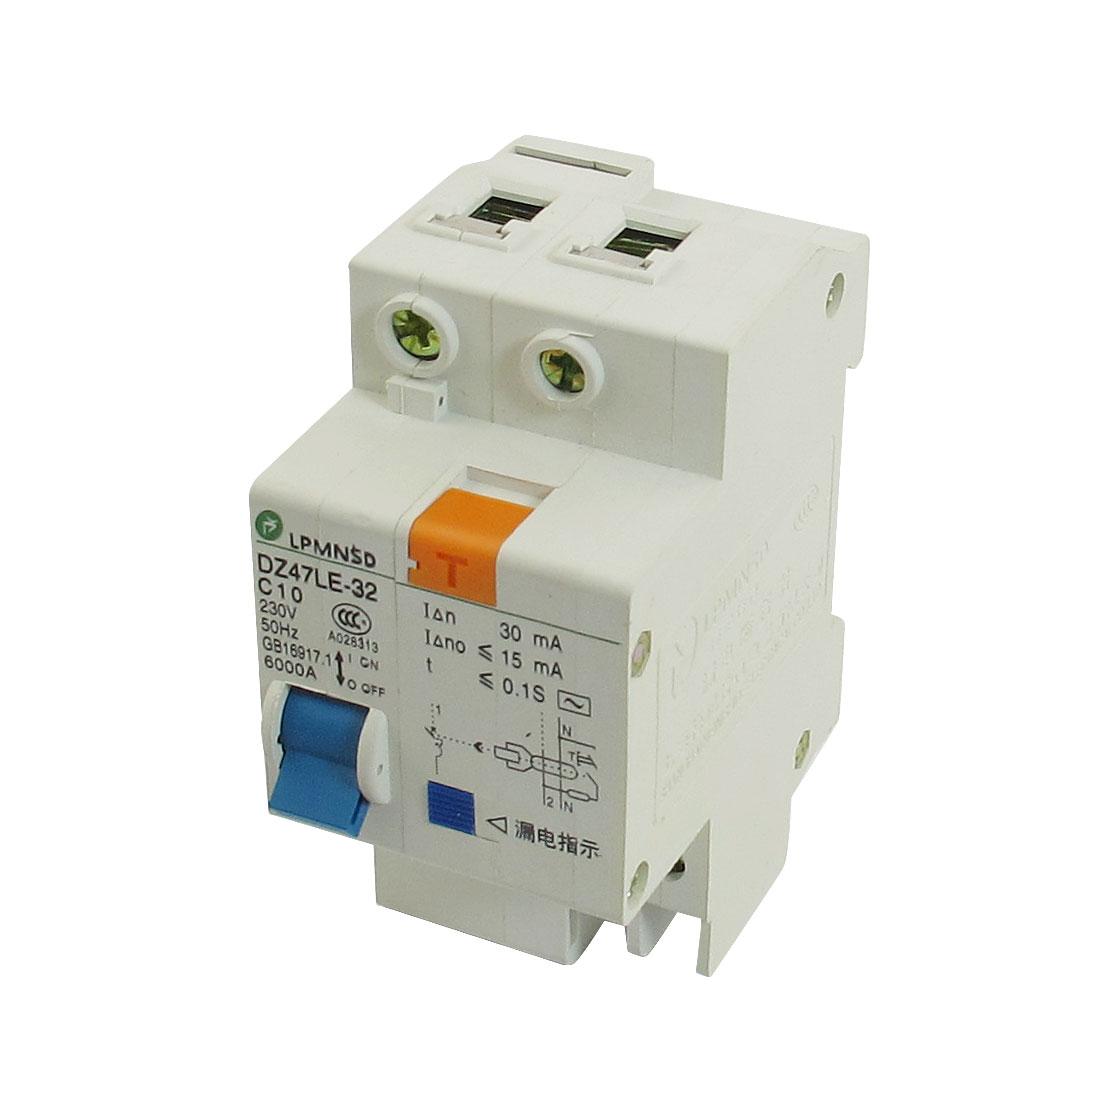 DIN Dail 1P Overload Proetction Circuit Breaker 230VAC 10A 6000A DZ47LE-32